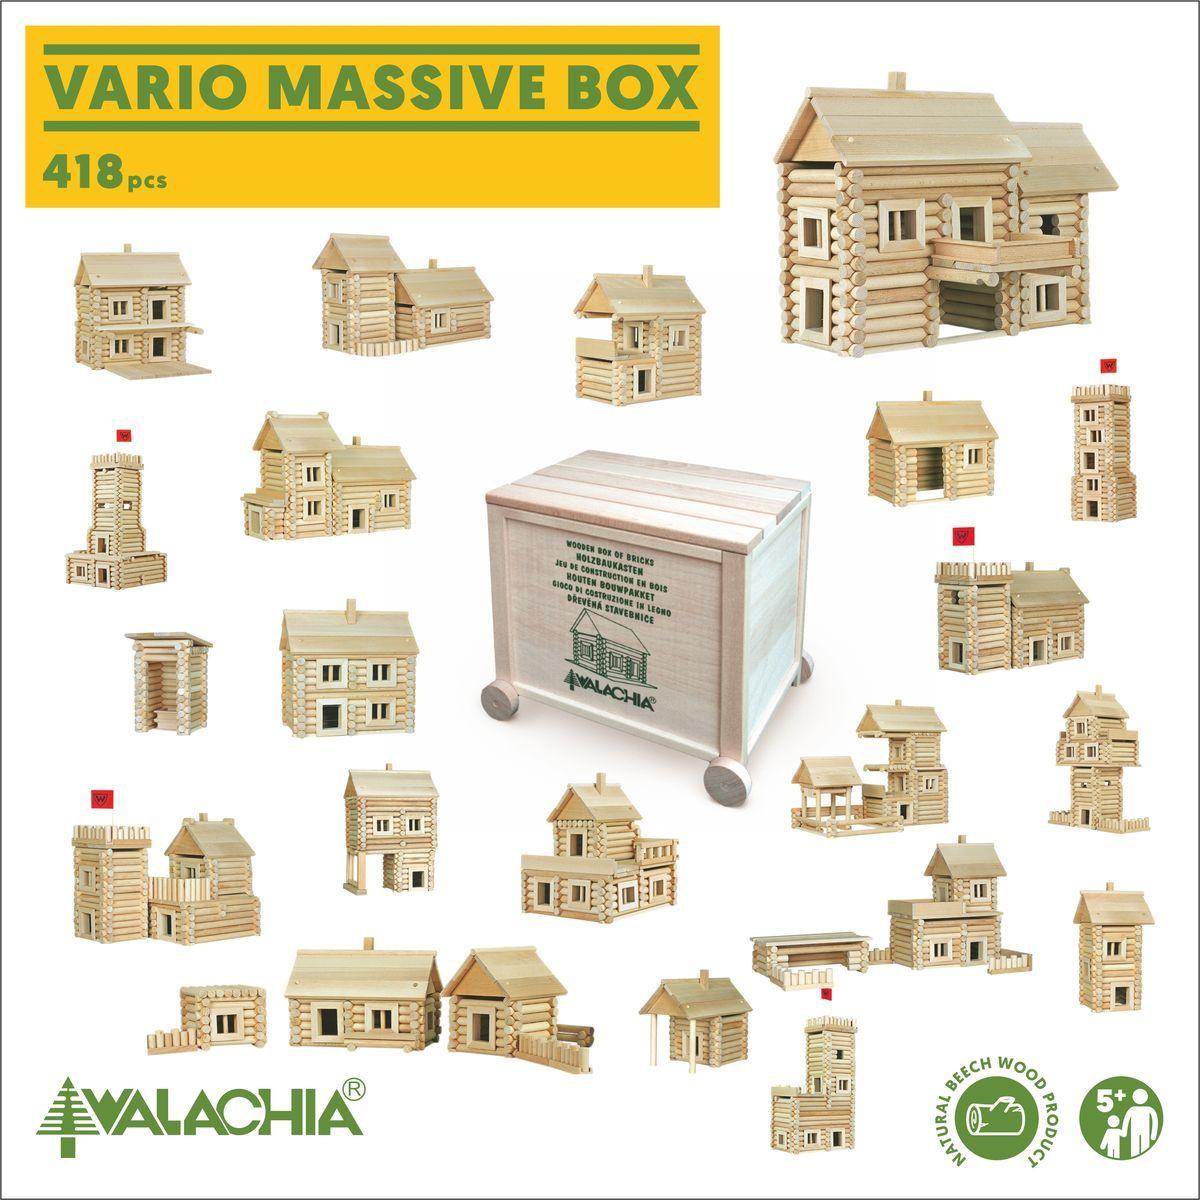 Walachia Vario Masive box